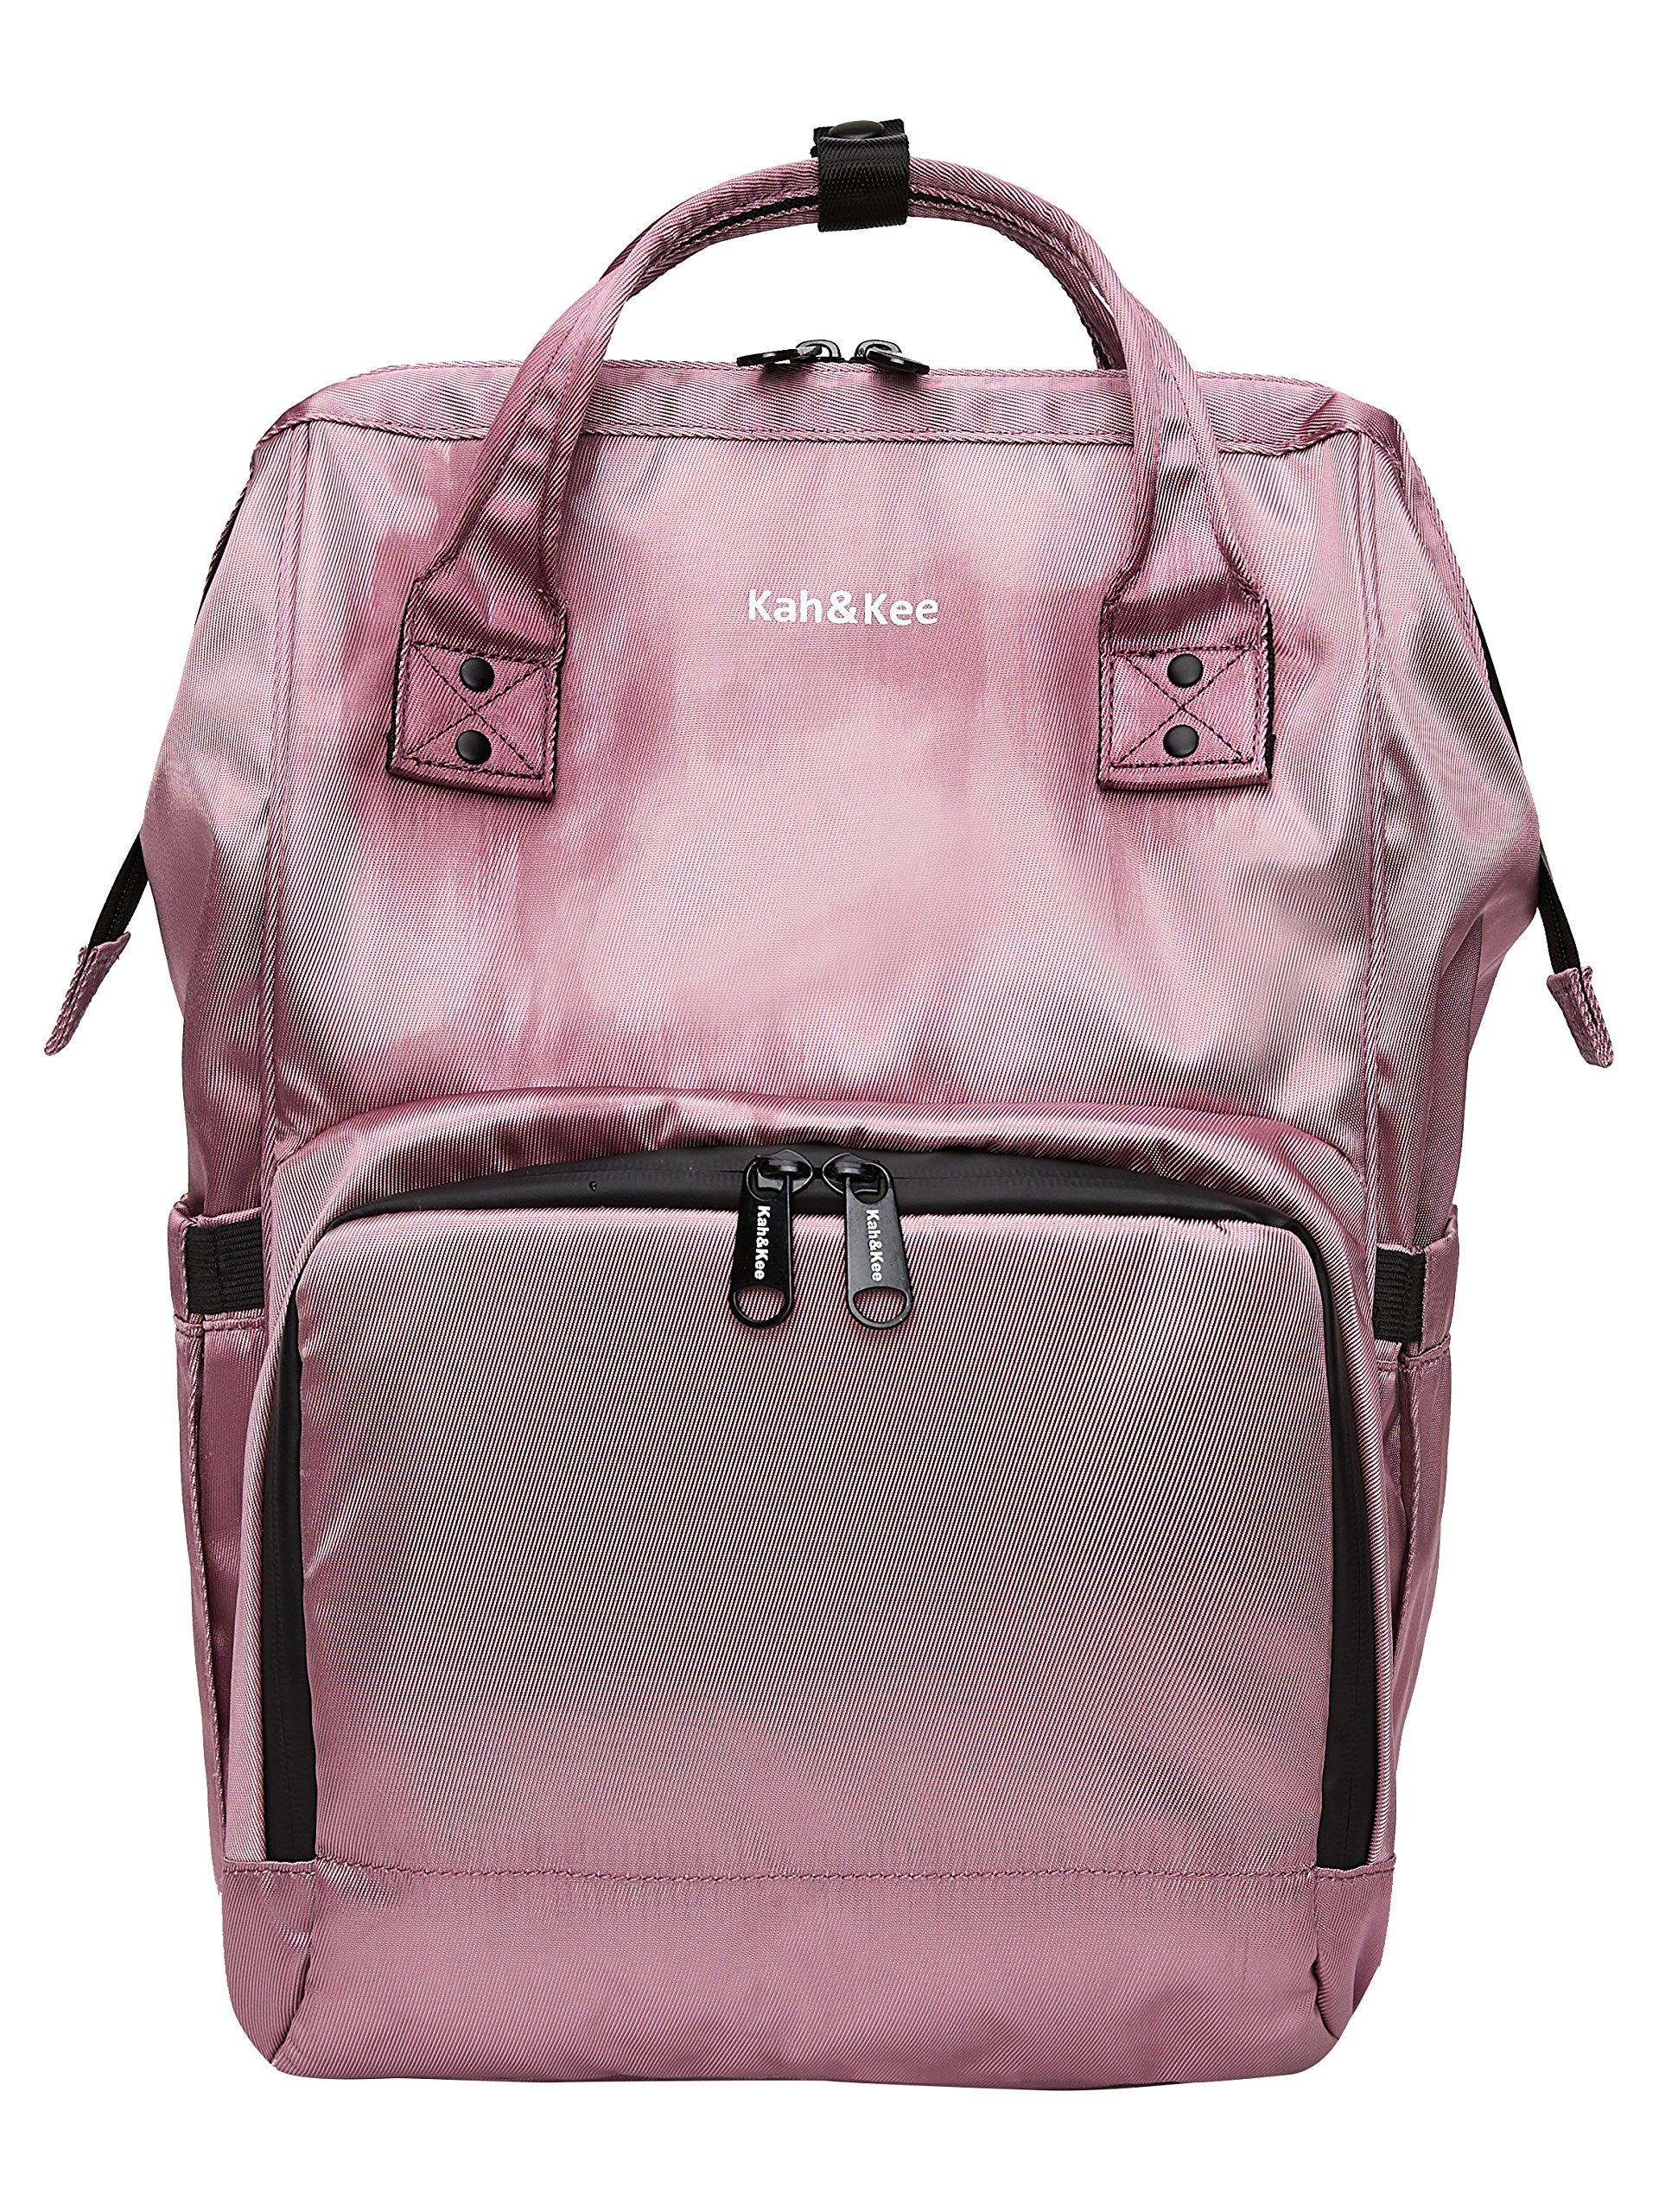 Kah&Kee Diaper Bag Backpack Organizer Waterproof Multifunction Anti-theft Travel Bags for Boys/Girls (Purple)